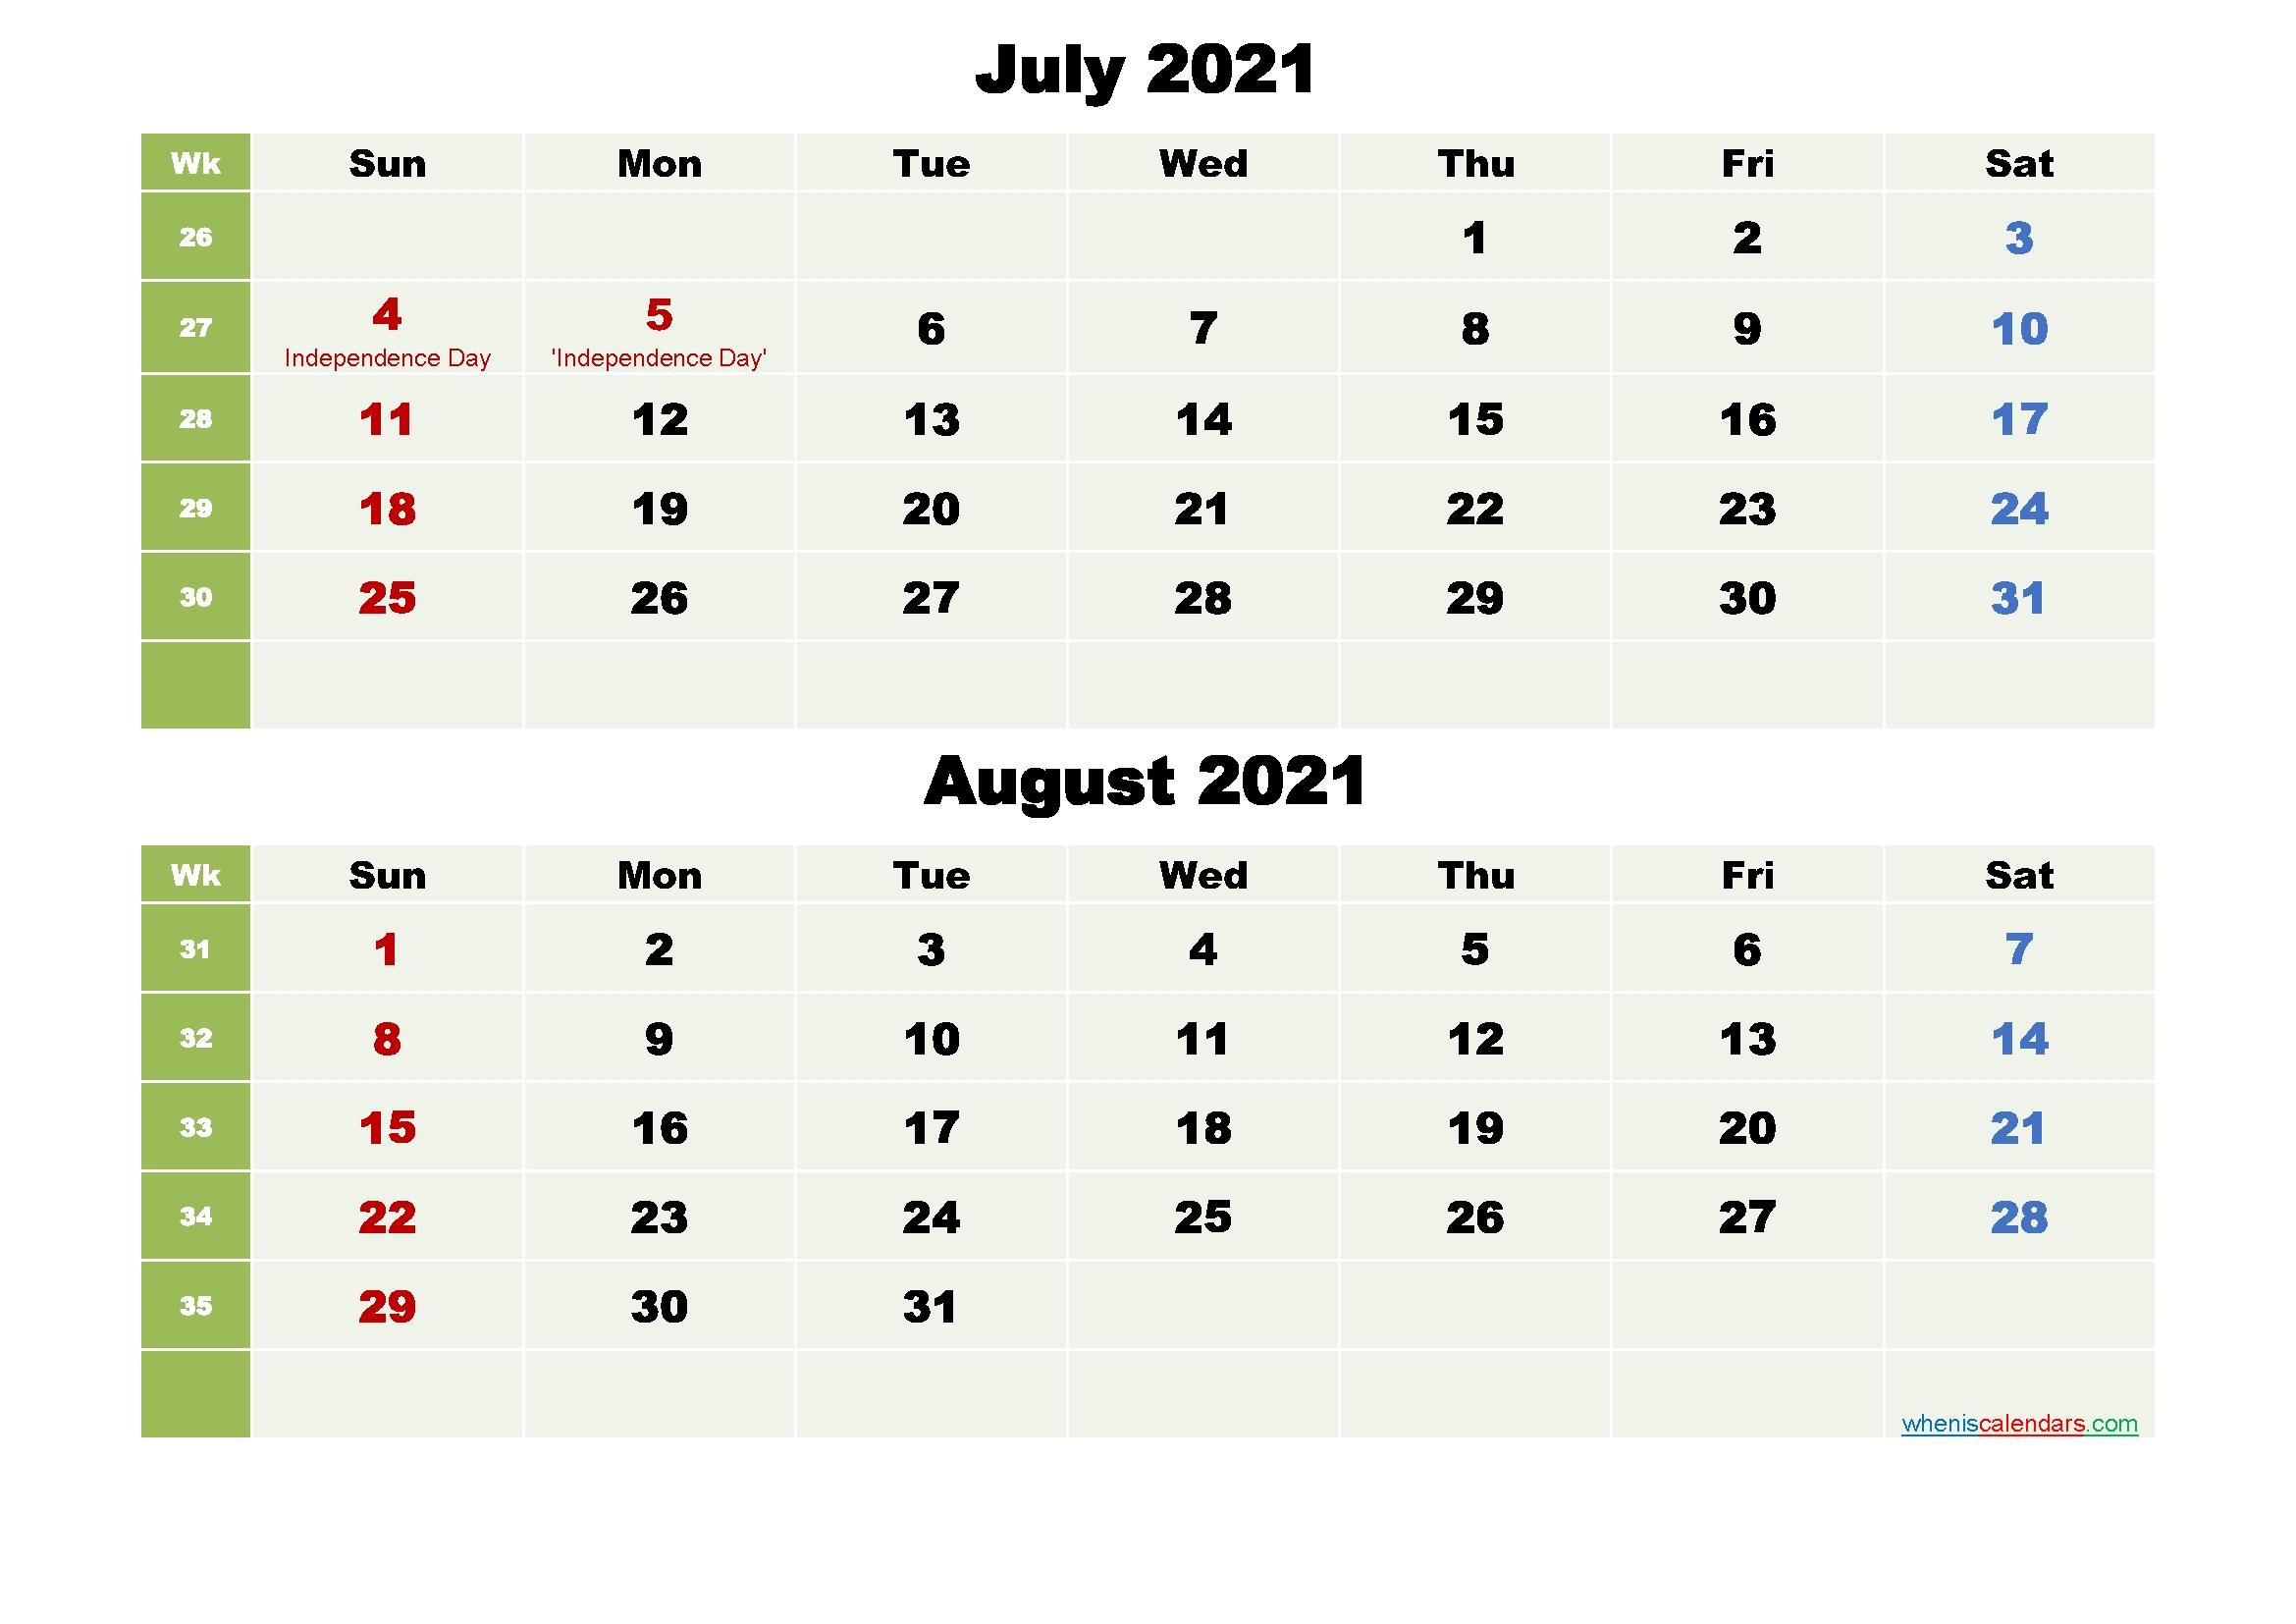 July And August Calendar 2021 Printable Word, Pdf - Free Printable 2020 Monthly Calendar With July 2021 Calendar Vertical